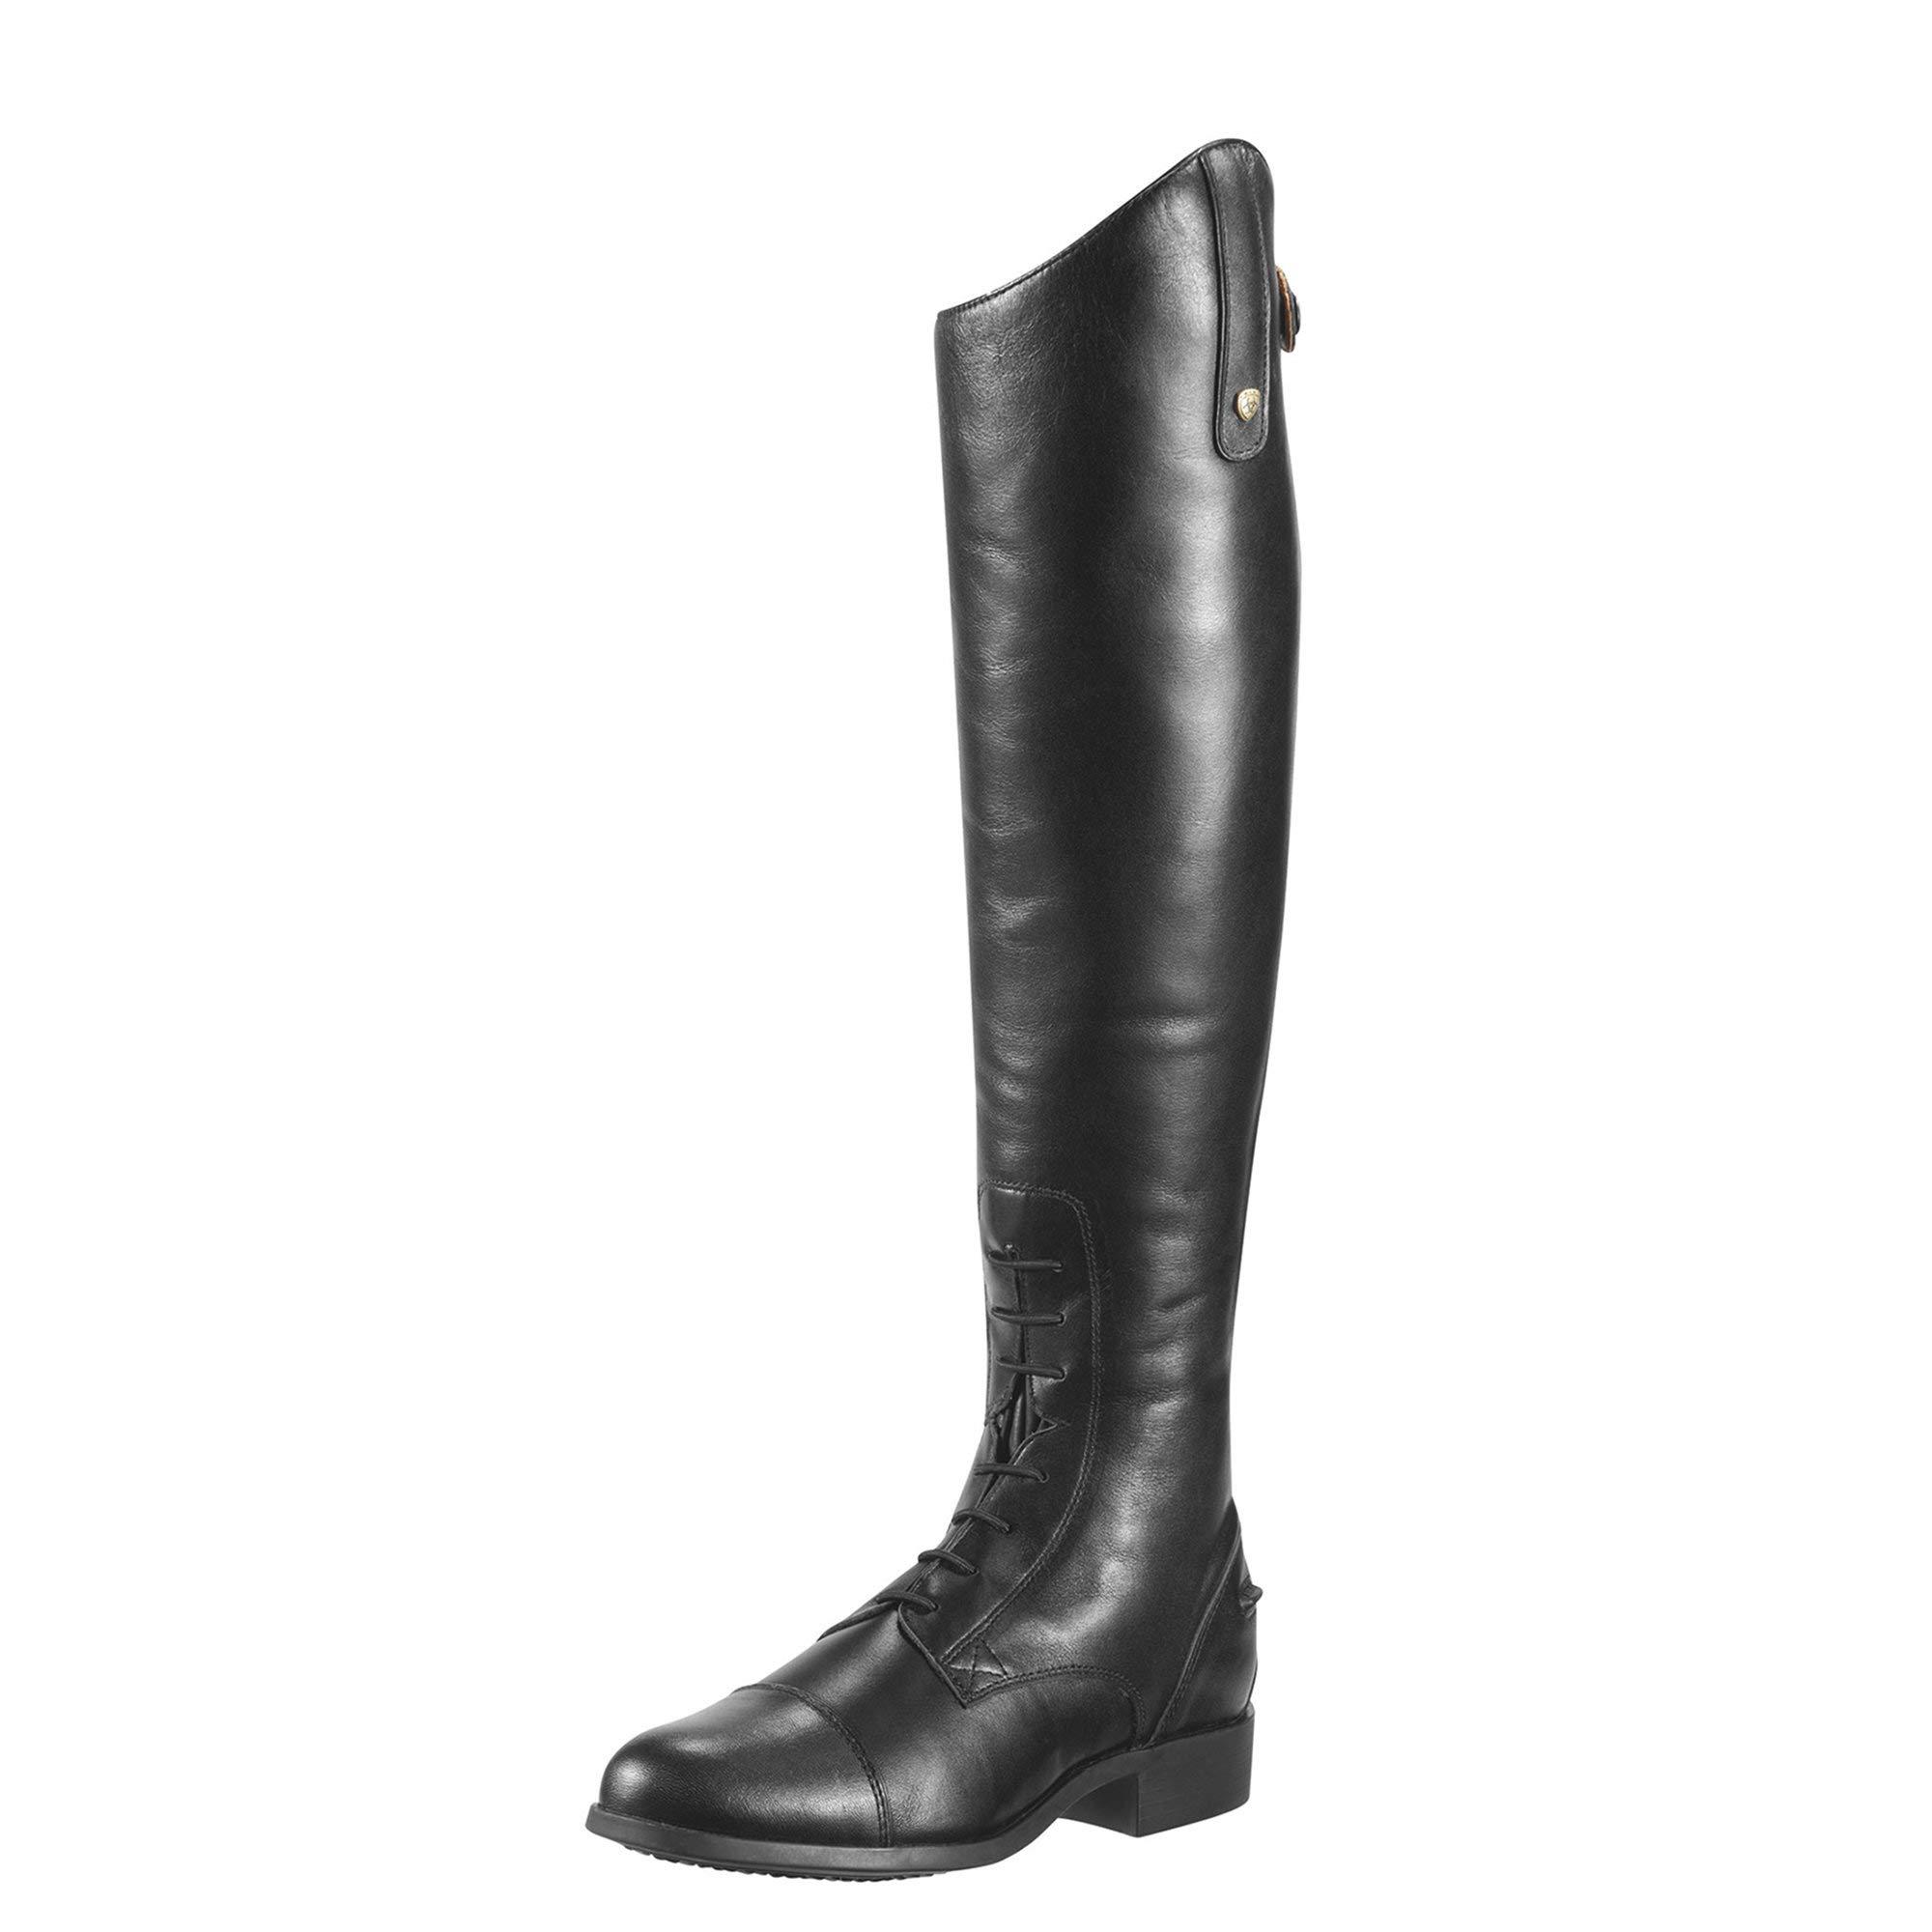 ARIAT Women's Heritage Contour Field Zip Tall Riding Boot Black Size 8.5 B/Medium Us by ARIAT